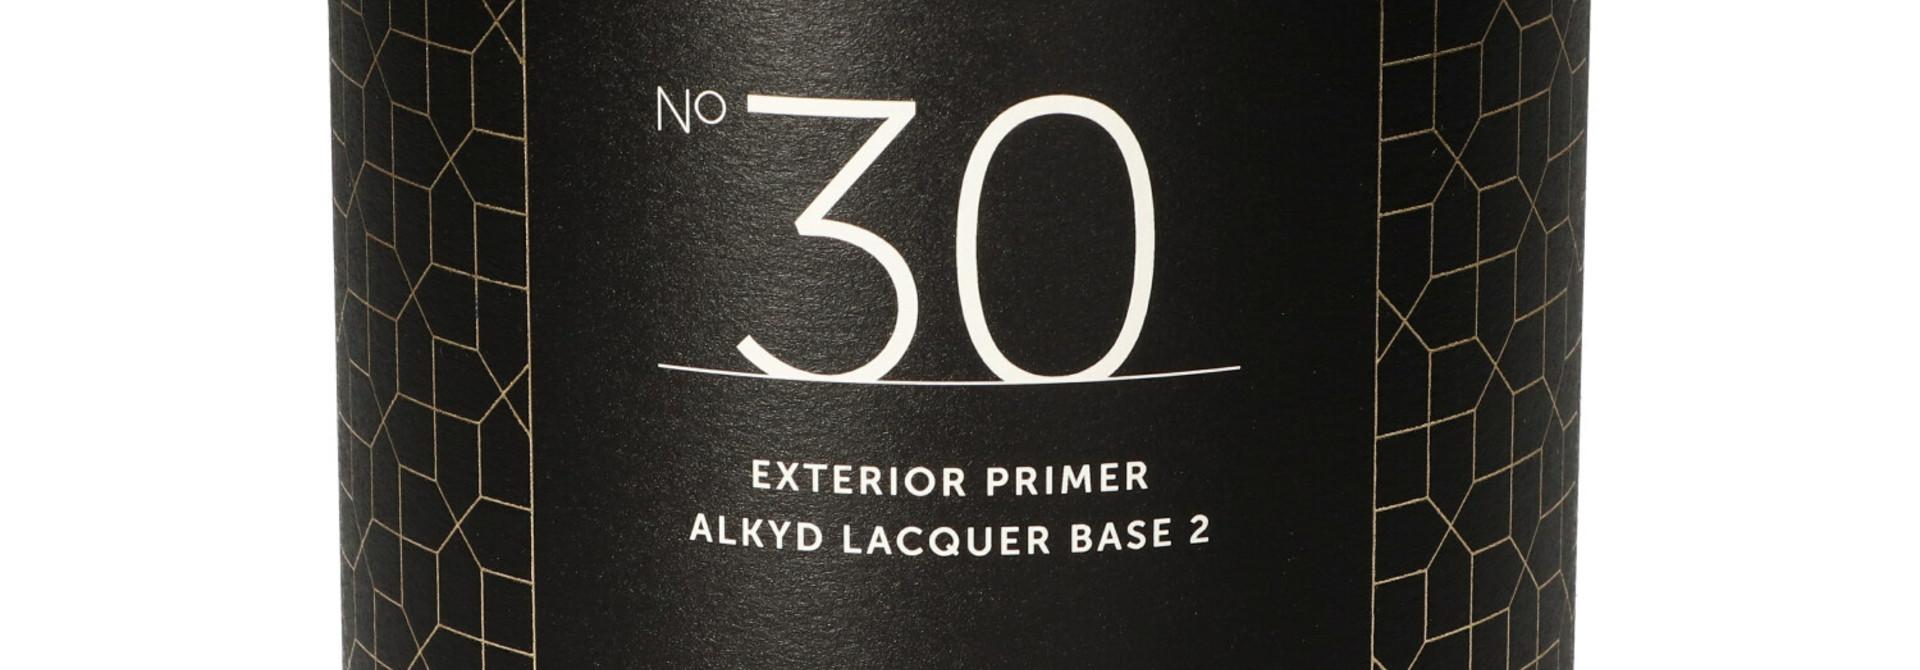 No. 30 EXTERIOR PRIMER alkyd - 1L